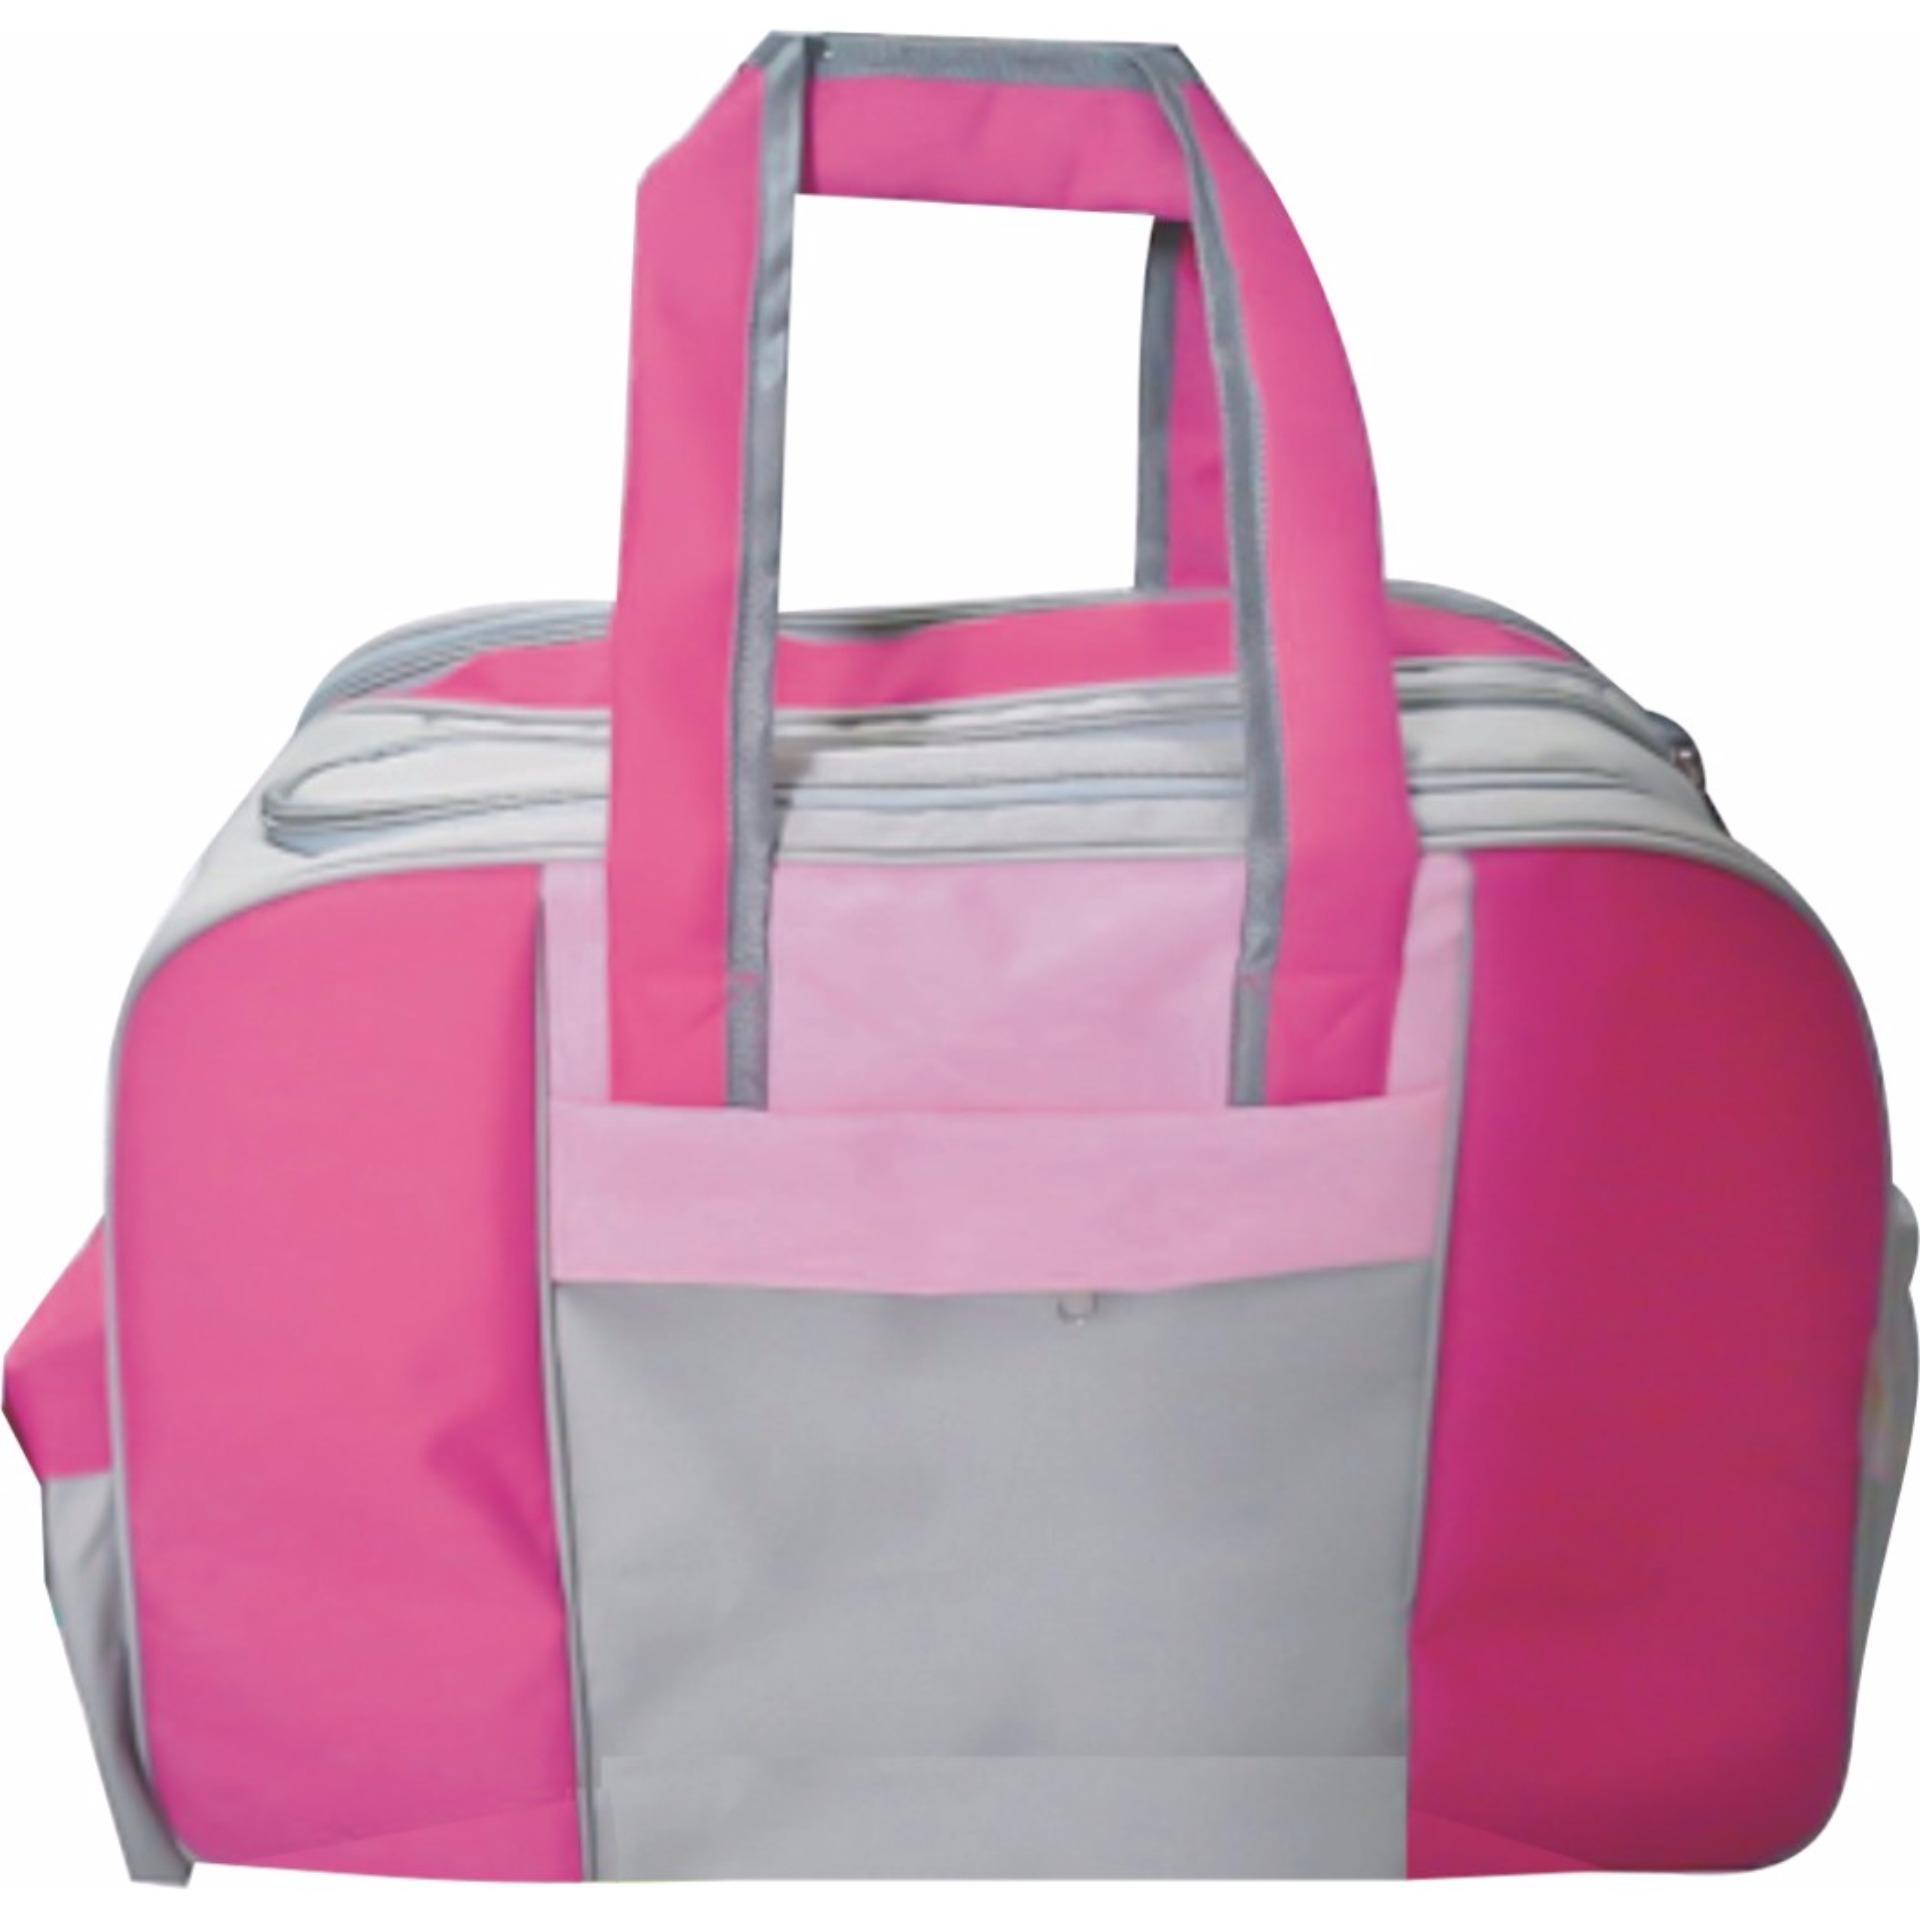 Toko Emwe Travel Baby Bag Organizer Large Tas Botol Susu Bayi Balita Diaper Travell Magenta Pink Murah Di Jawa Tengah